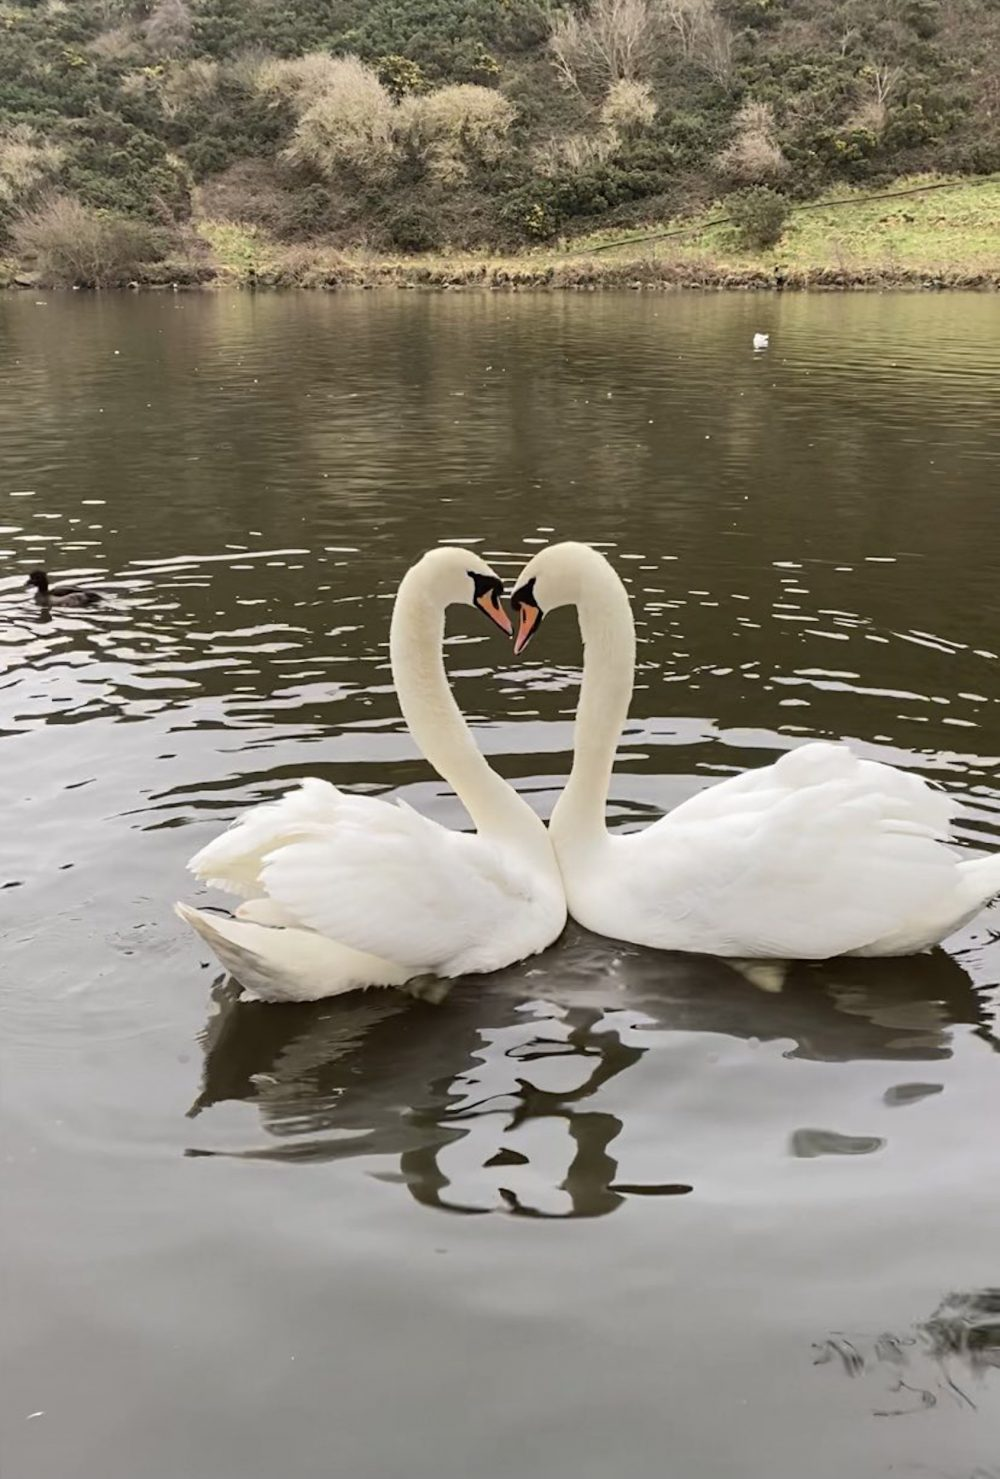 The Edinburgh Swan's in a romantic embrace -Viral News Scotland